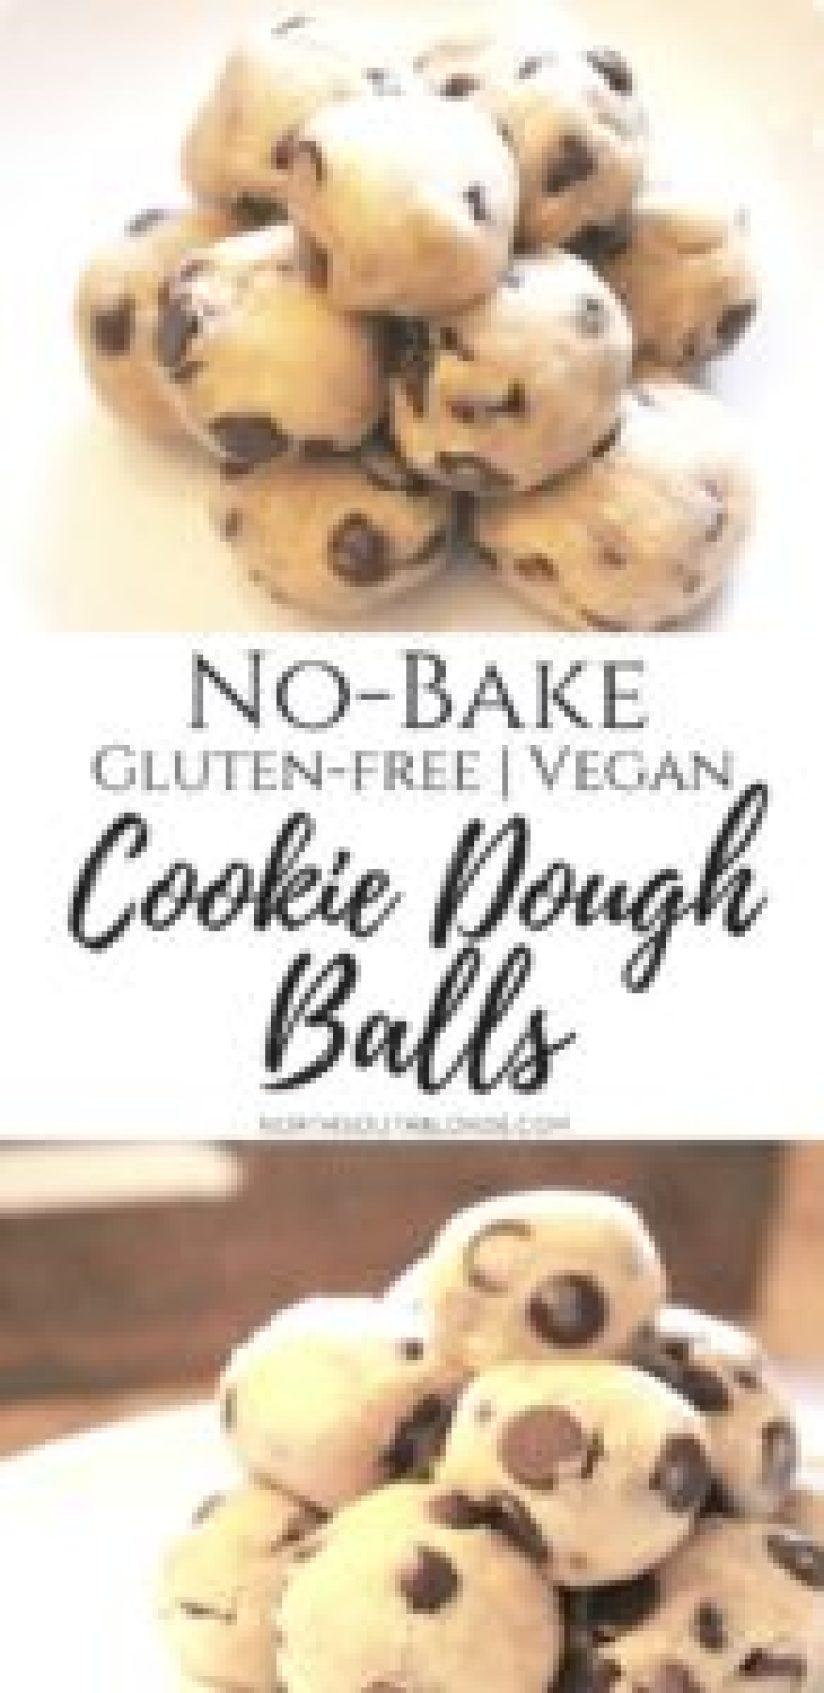 No-Bake Gluten-free Vegan Cookie Dough Balls